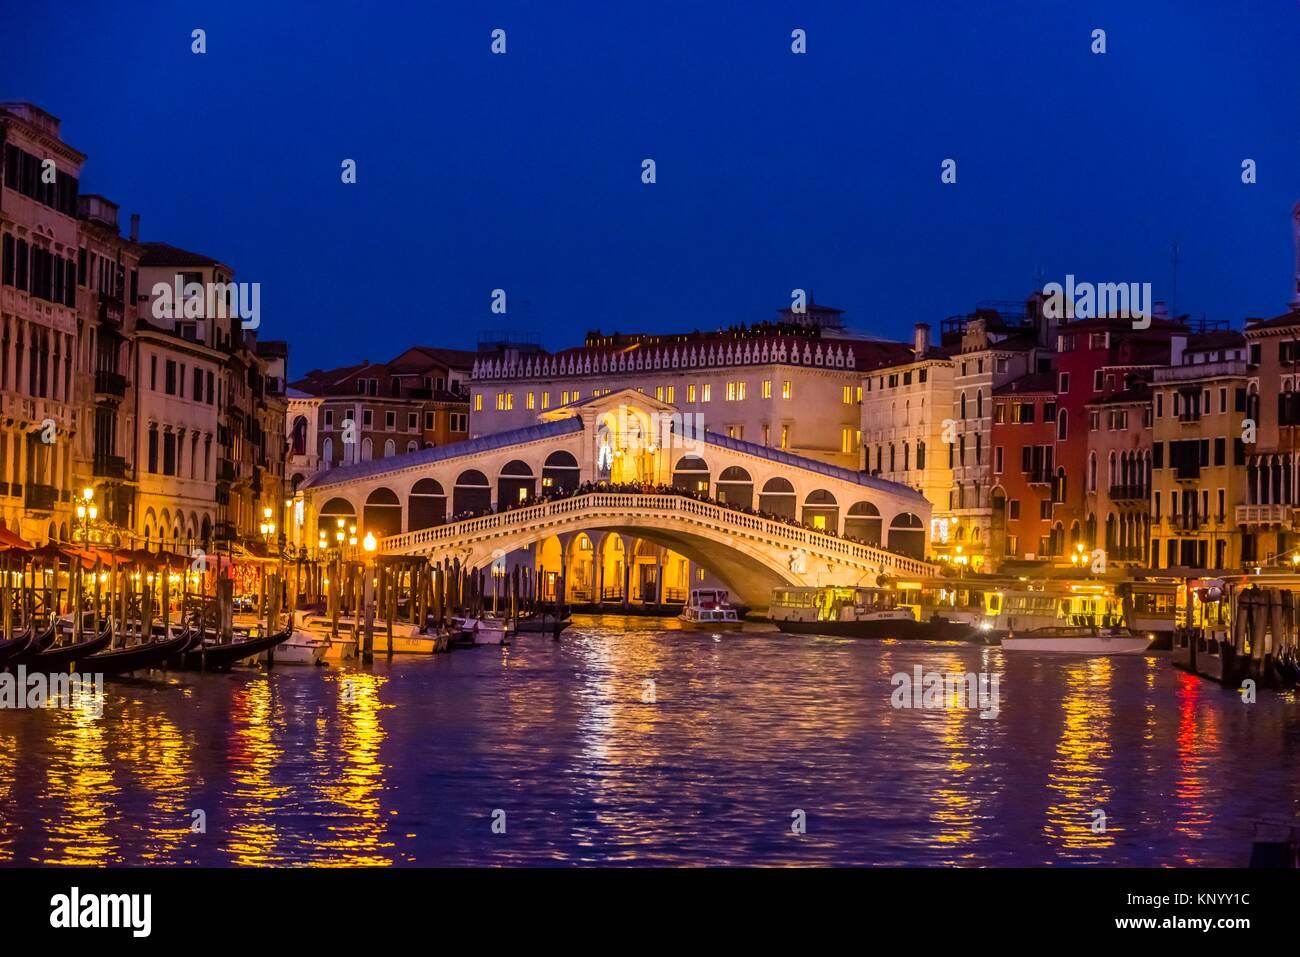 Rialto Brücke, Grand Canal, Venice, Italien. Stockbild